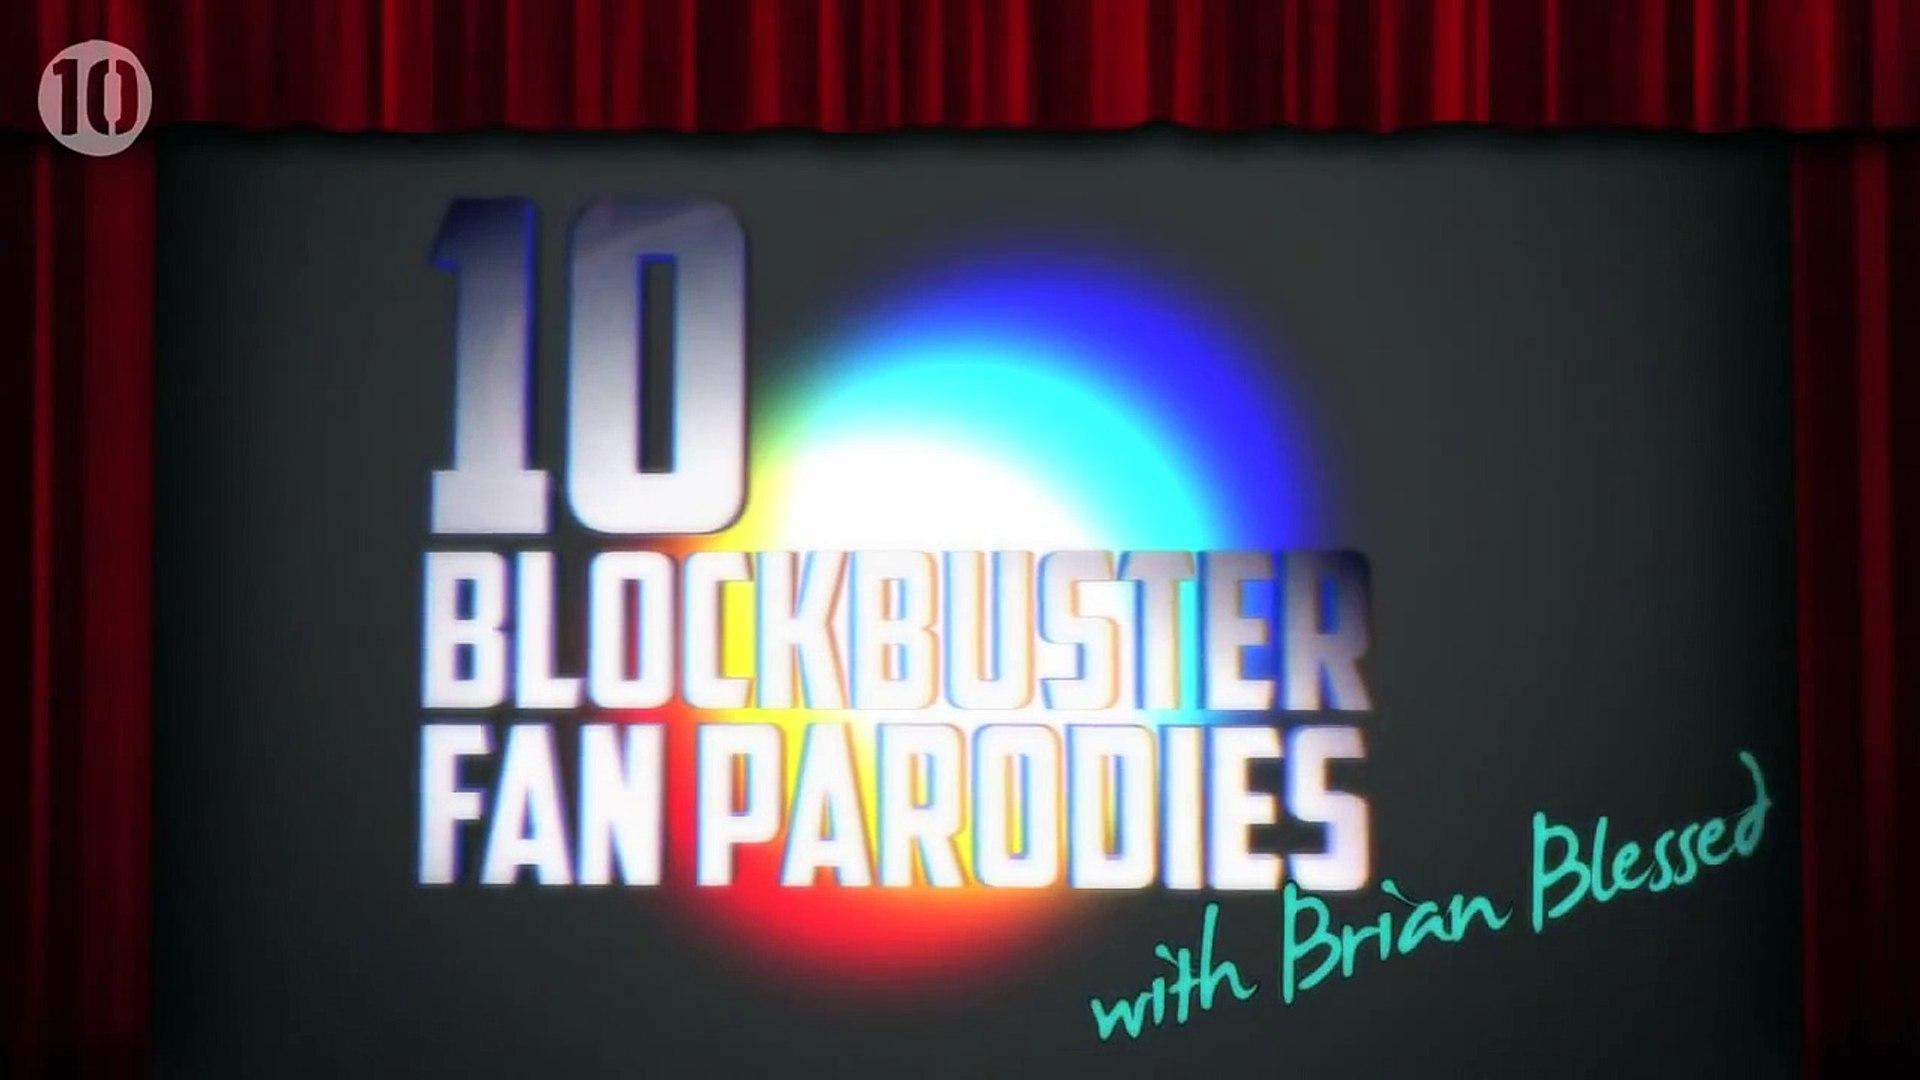 10 Best Blockbuster Fan Parodies w/Brian Blessed